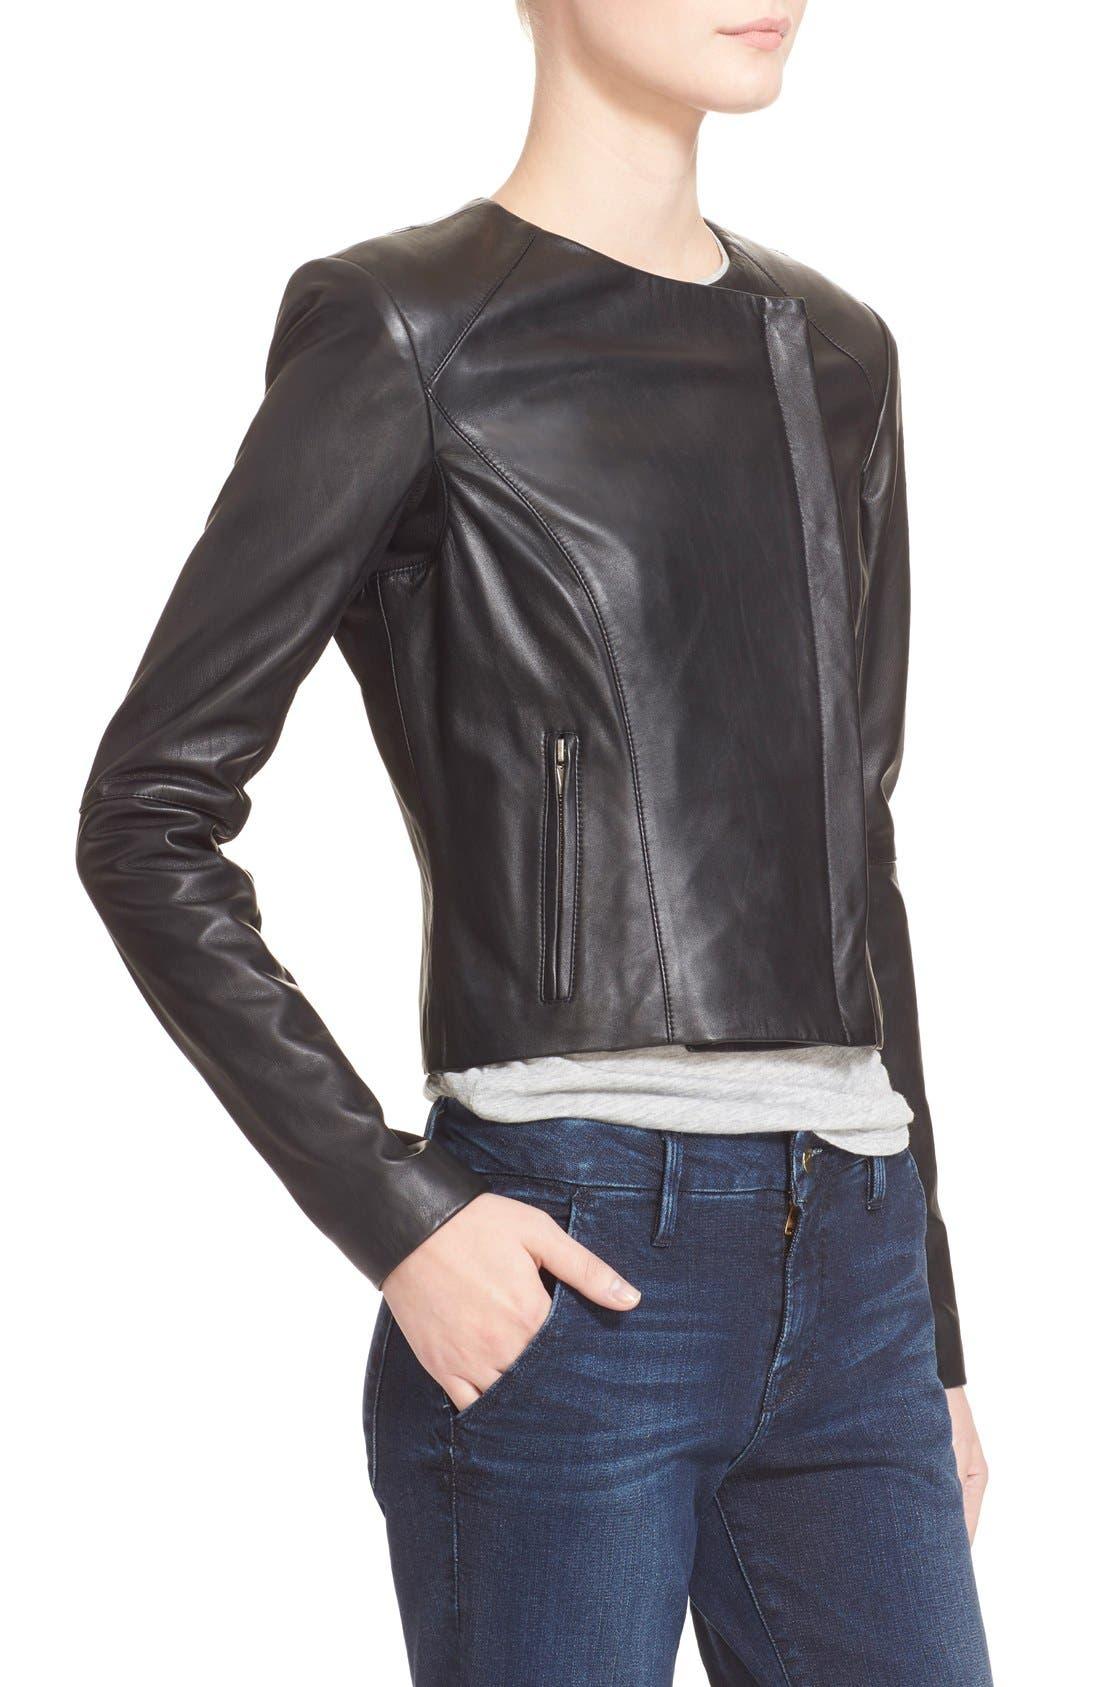 VEDA, 'Dali' Leather Jacket, Alternate thumbnail 3, color, 001